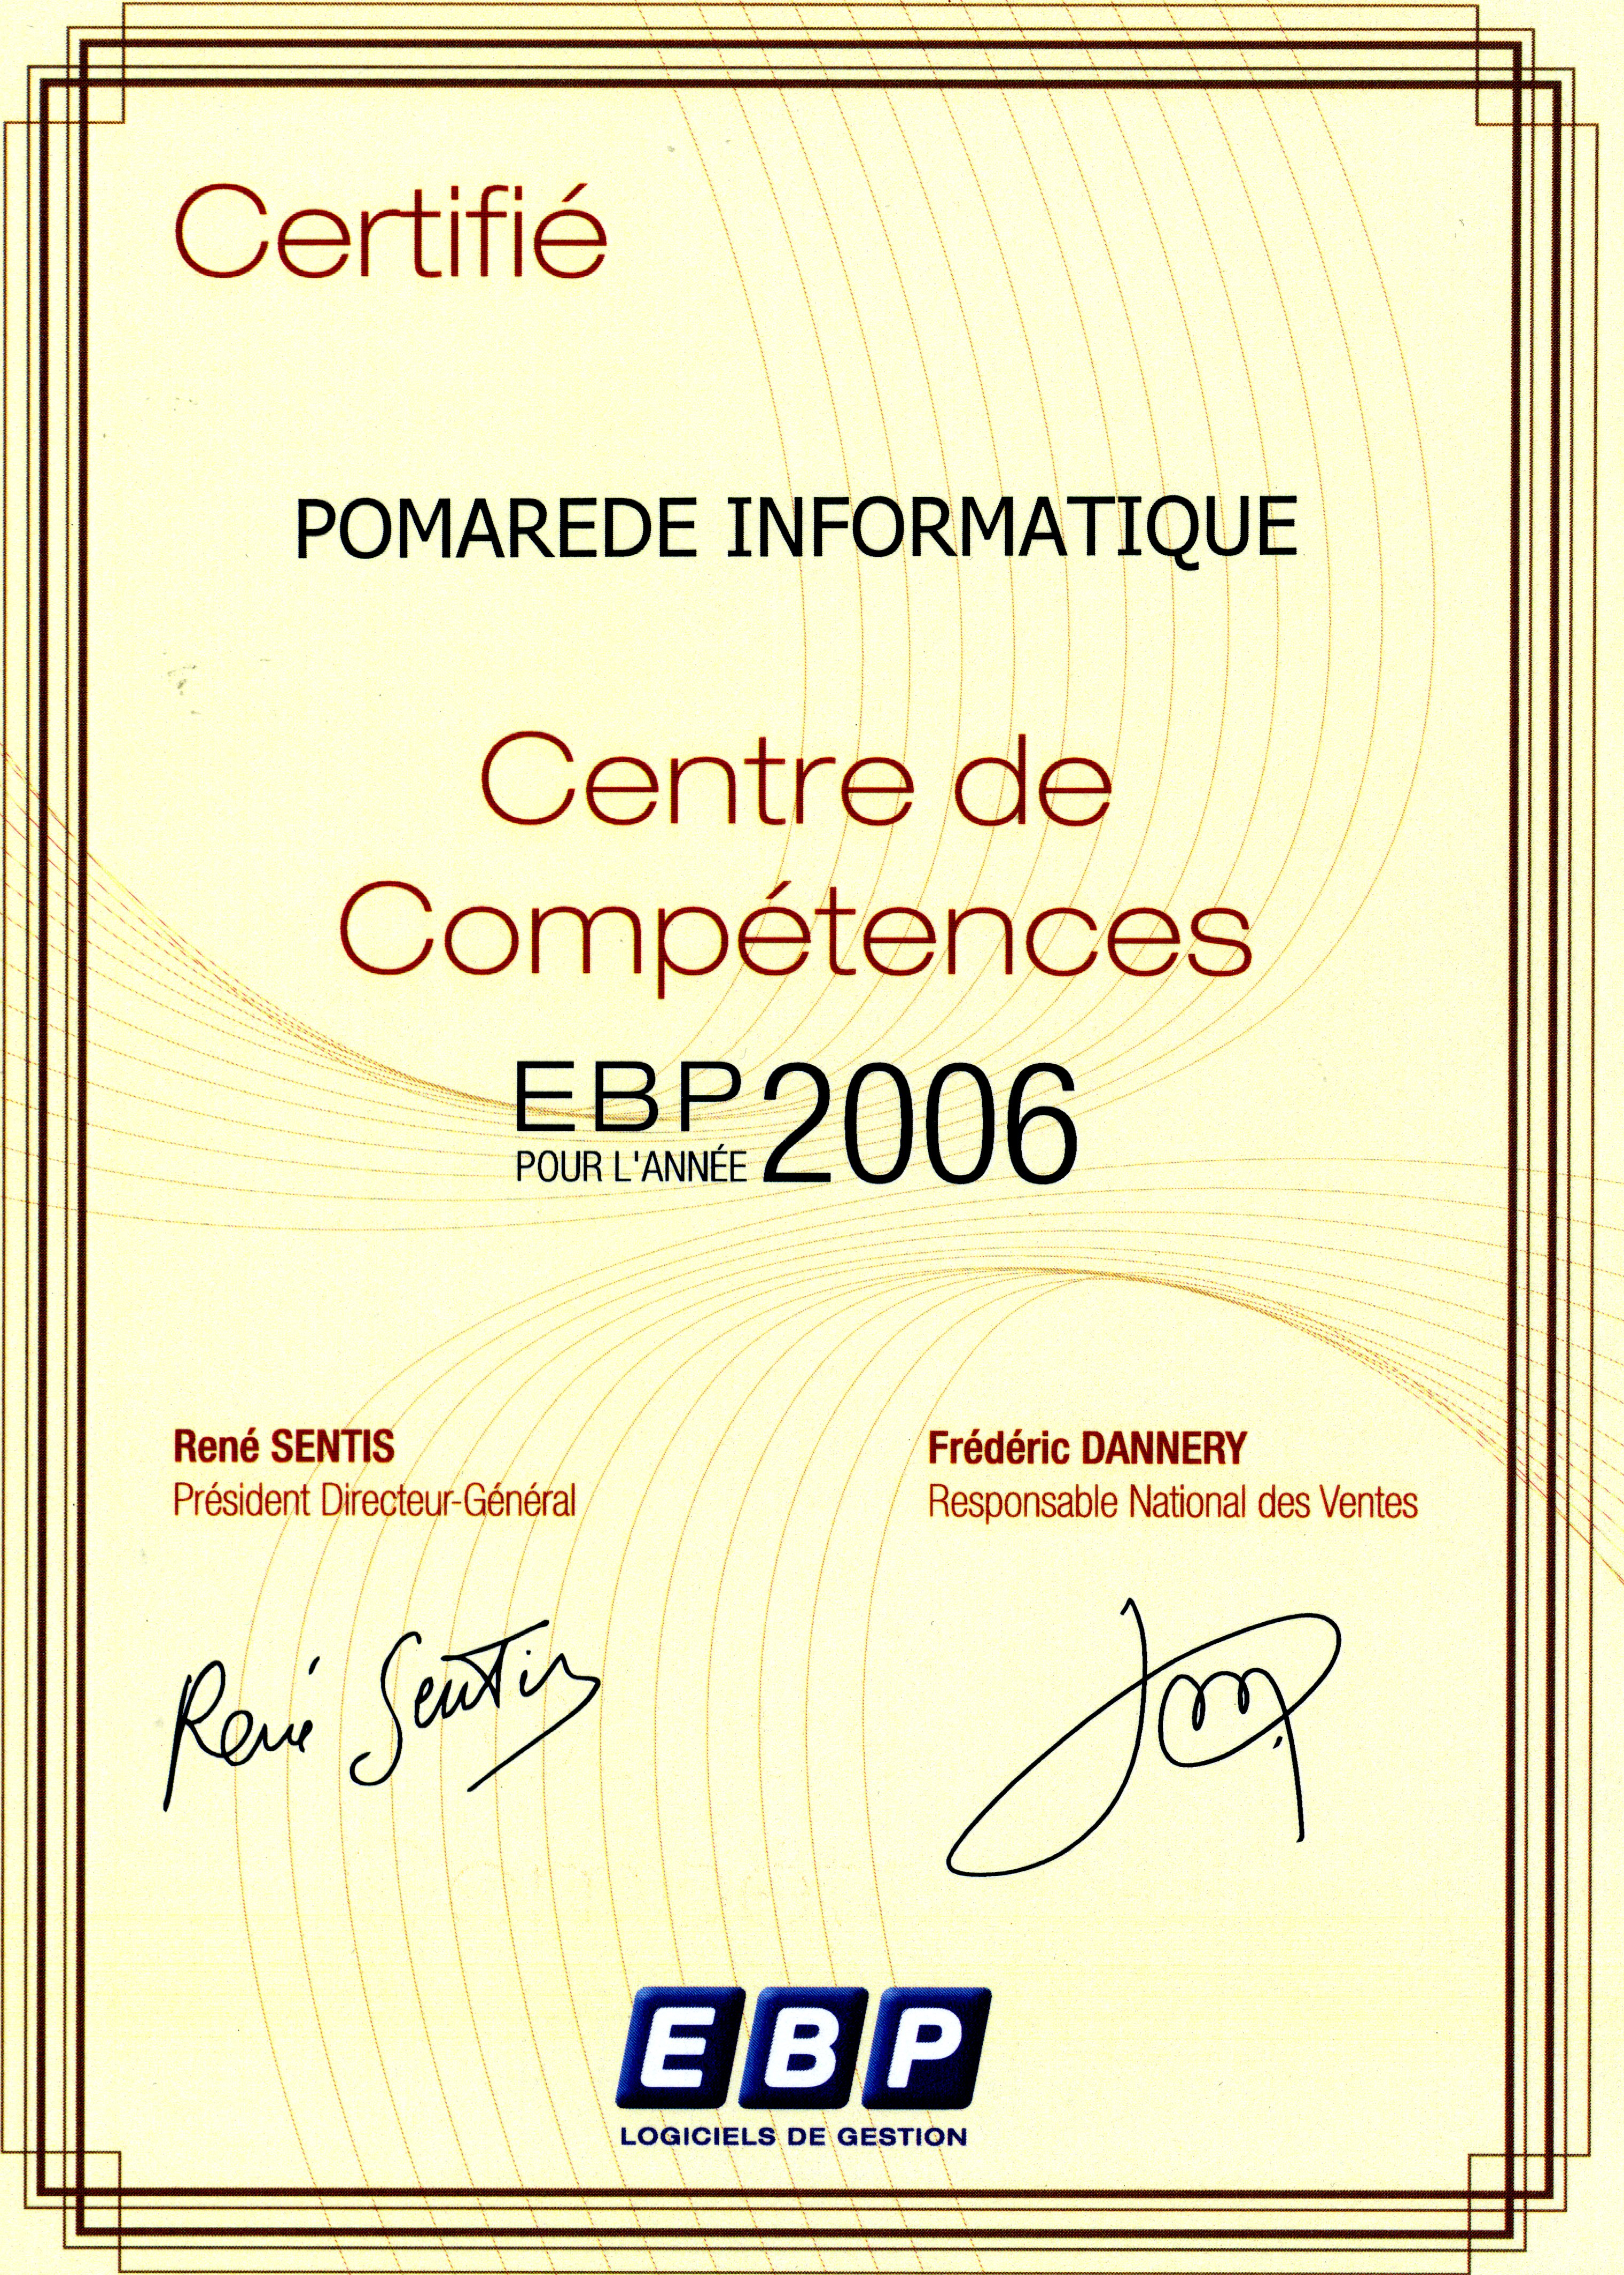 EBP COMPTA CLASSIC 2011 TÉLÉCHARGER